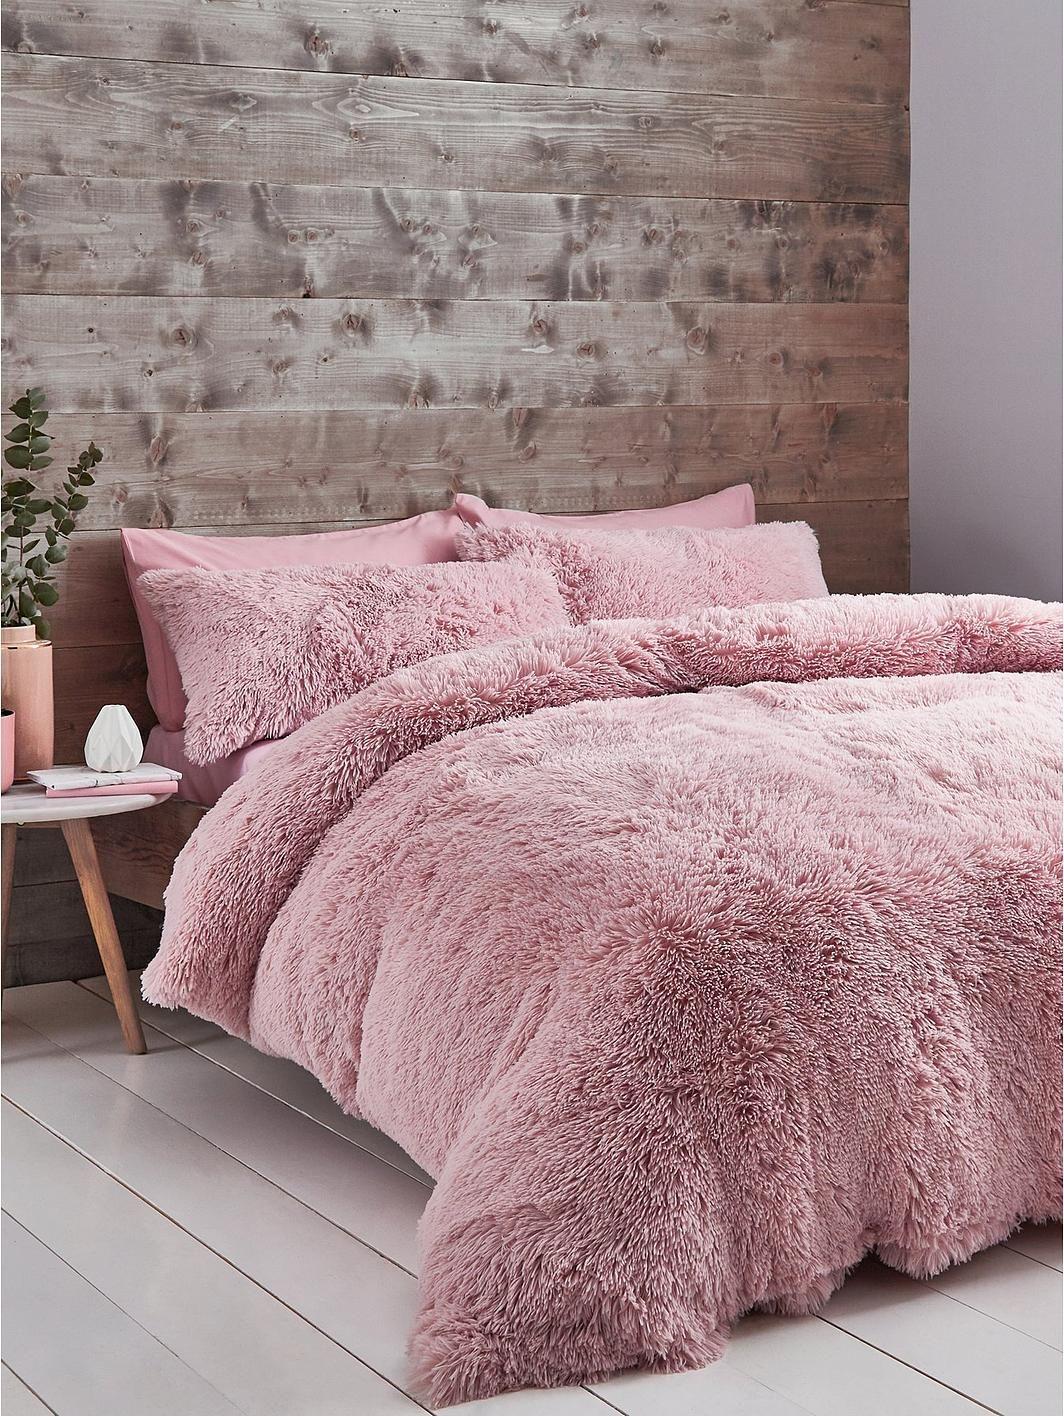 Catherine Lansfield Cuddly Faux Fur Duvet Cover Set Duvet Cover Sets Pink Duvet Blush Duvet